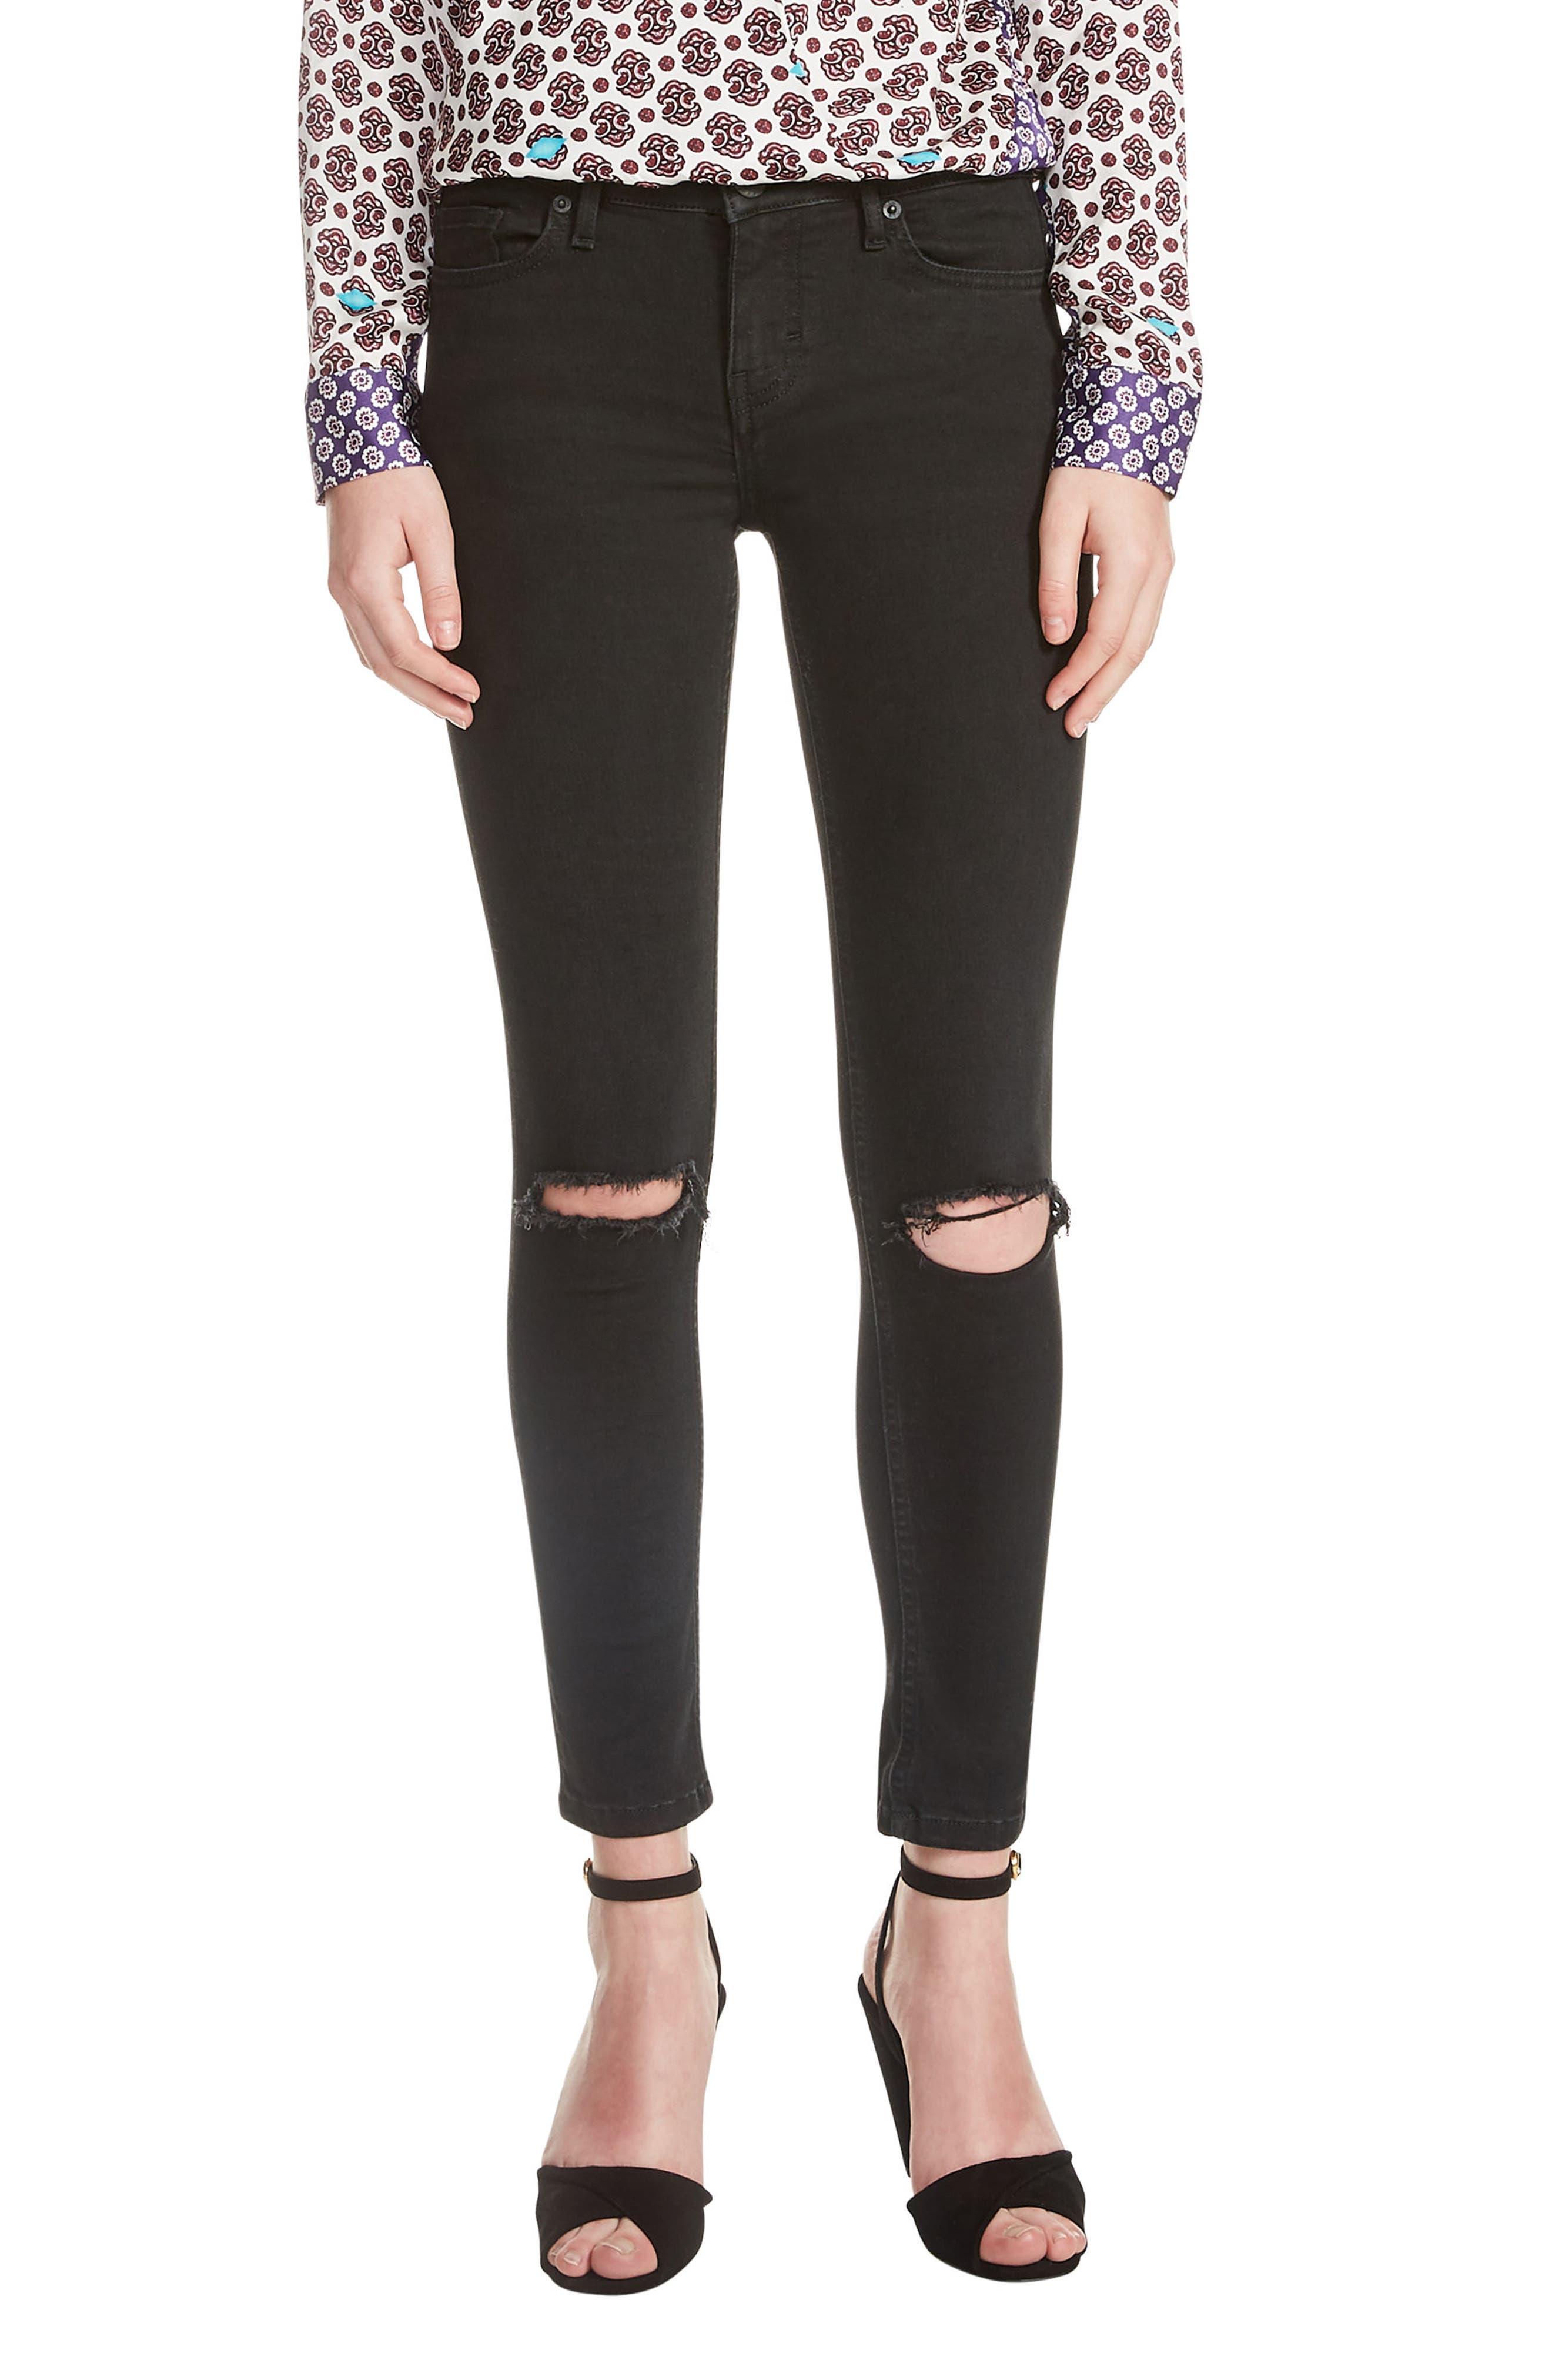 Priska Ripped Bee Embroidery Black Skinny Jeans,                         Main,                         color, Black